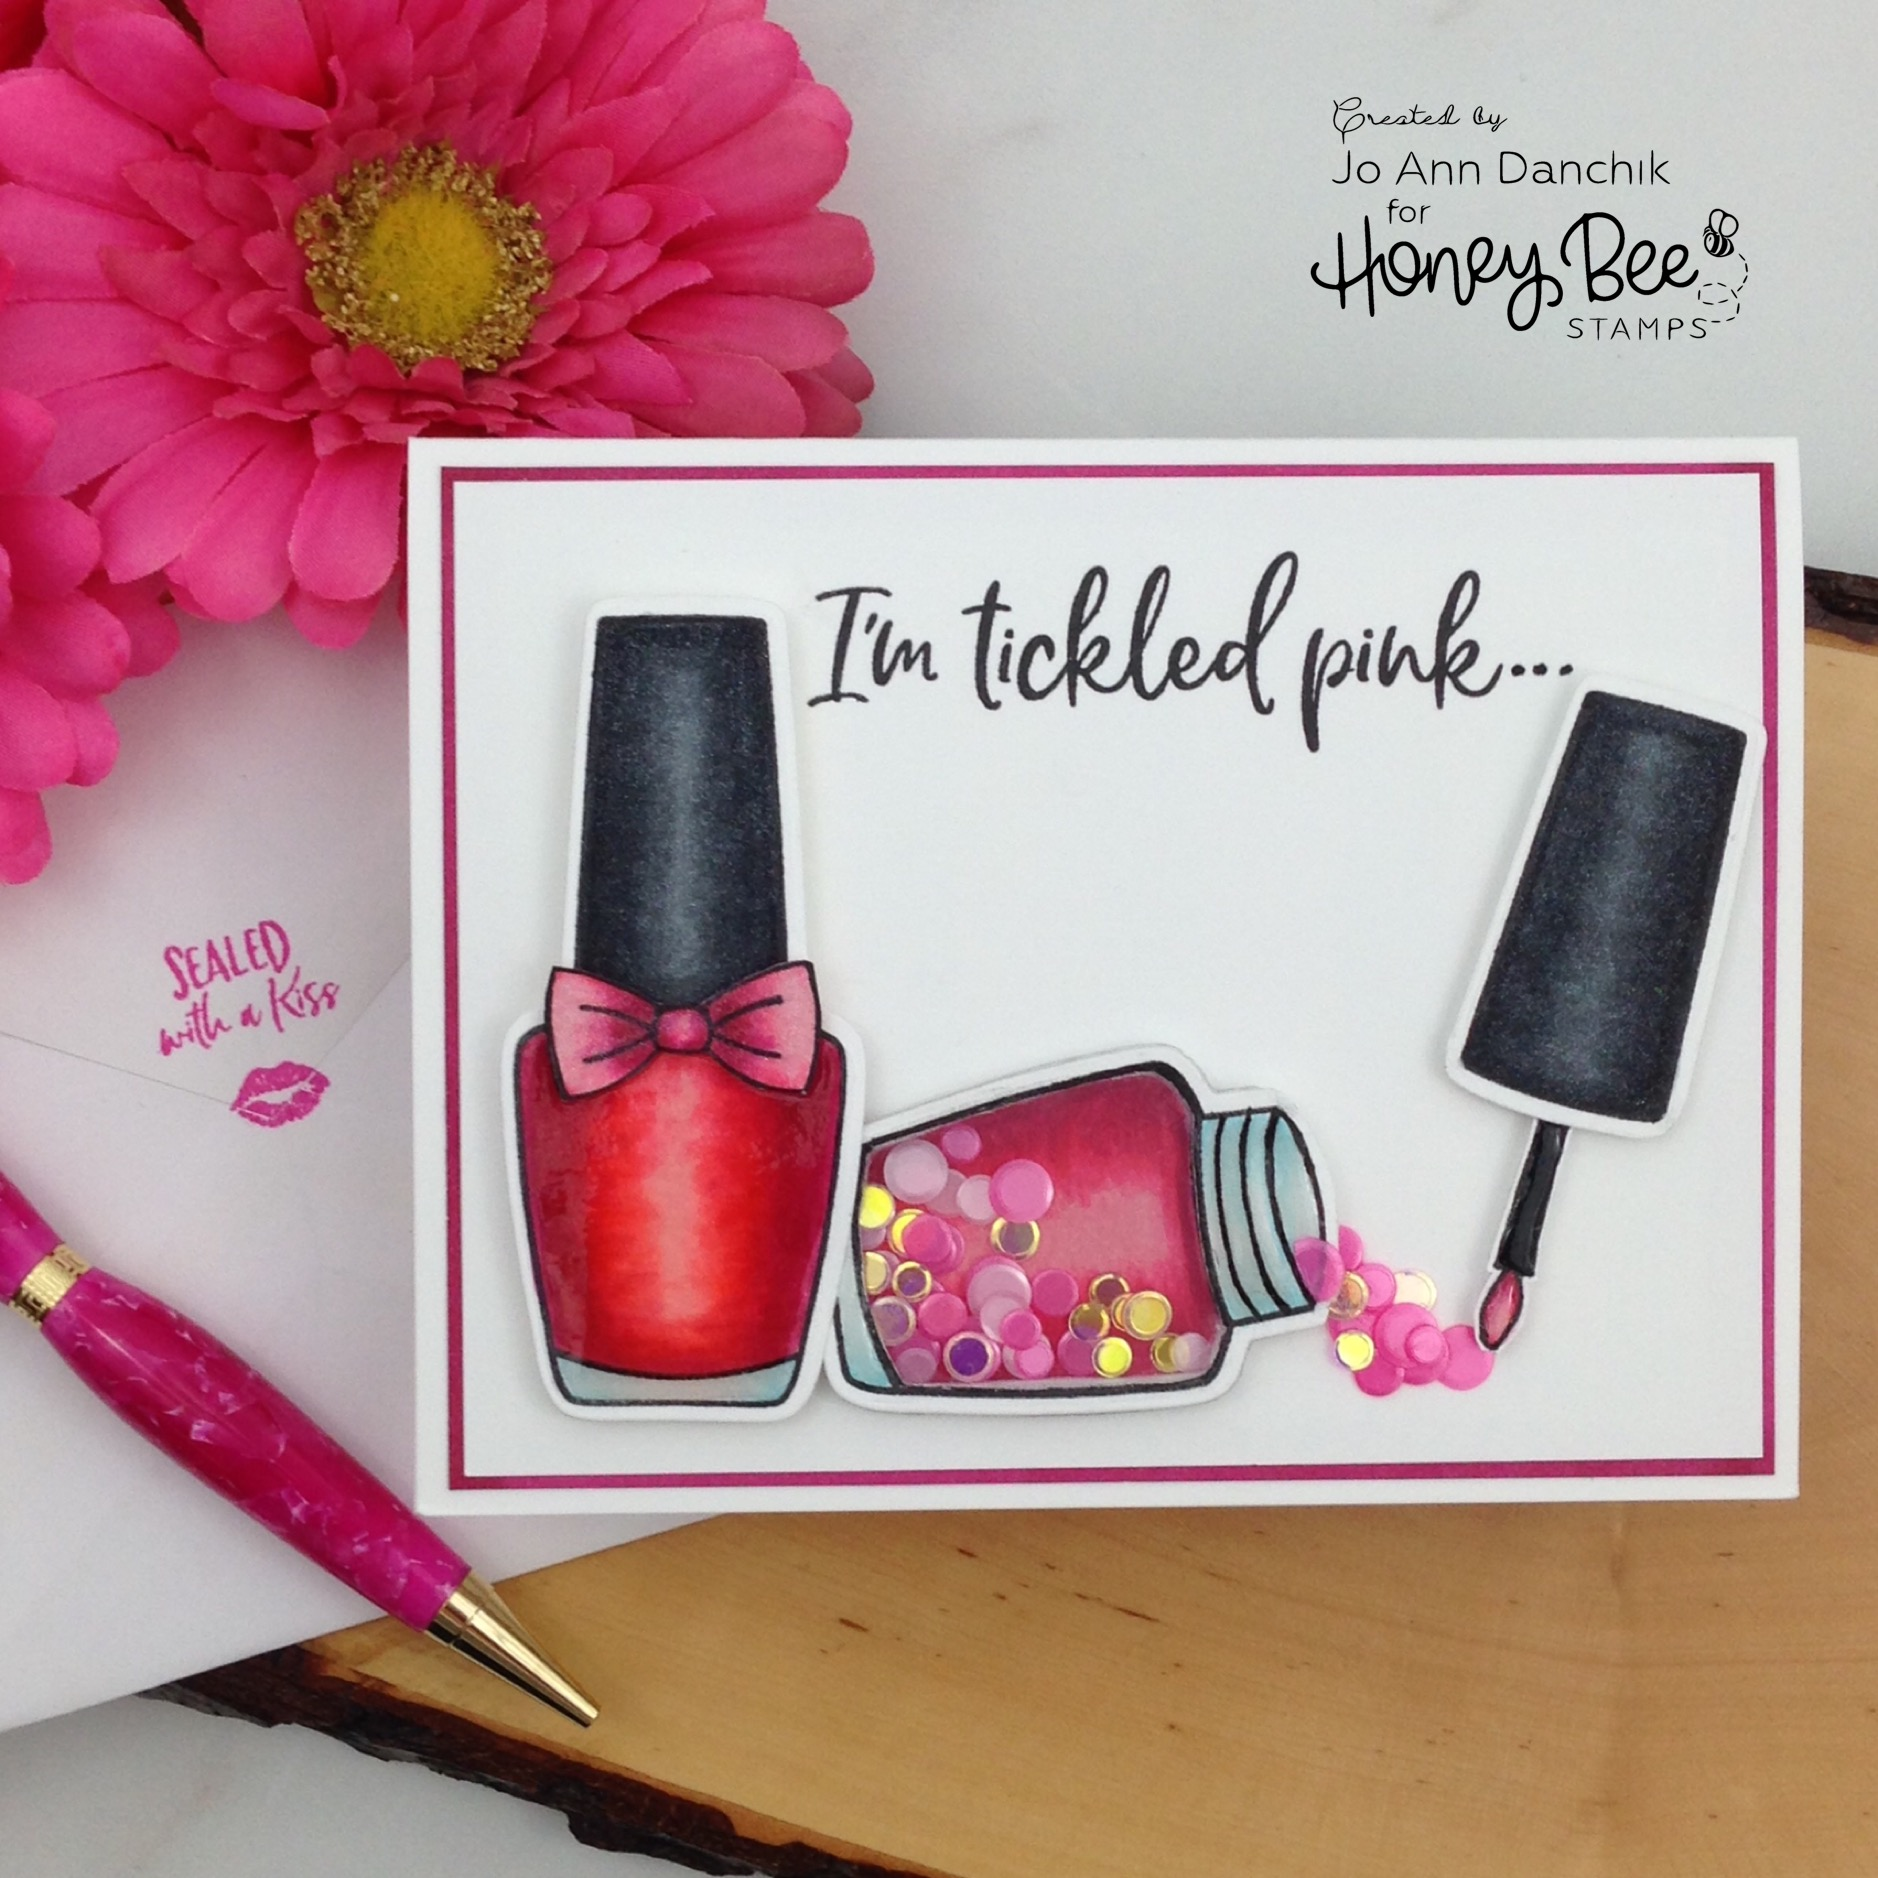 Creative Sundays With Jo Ann: Tickled Pink